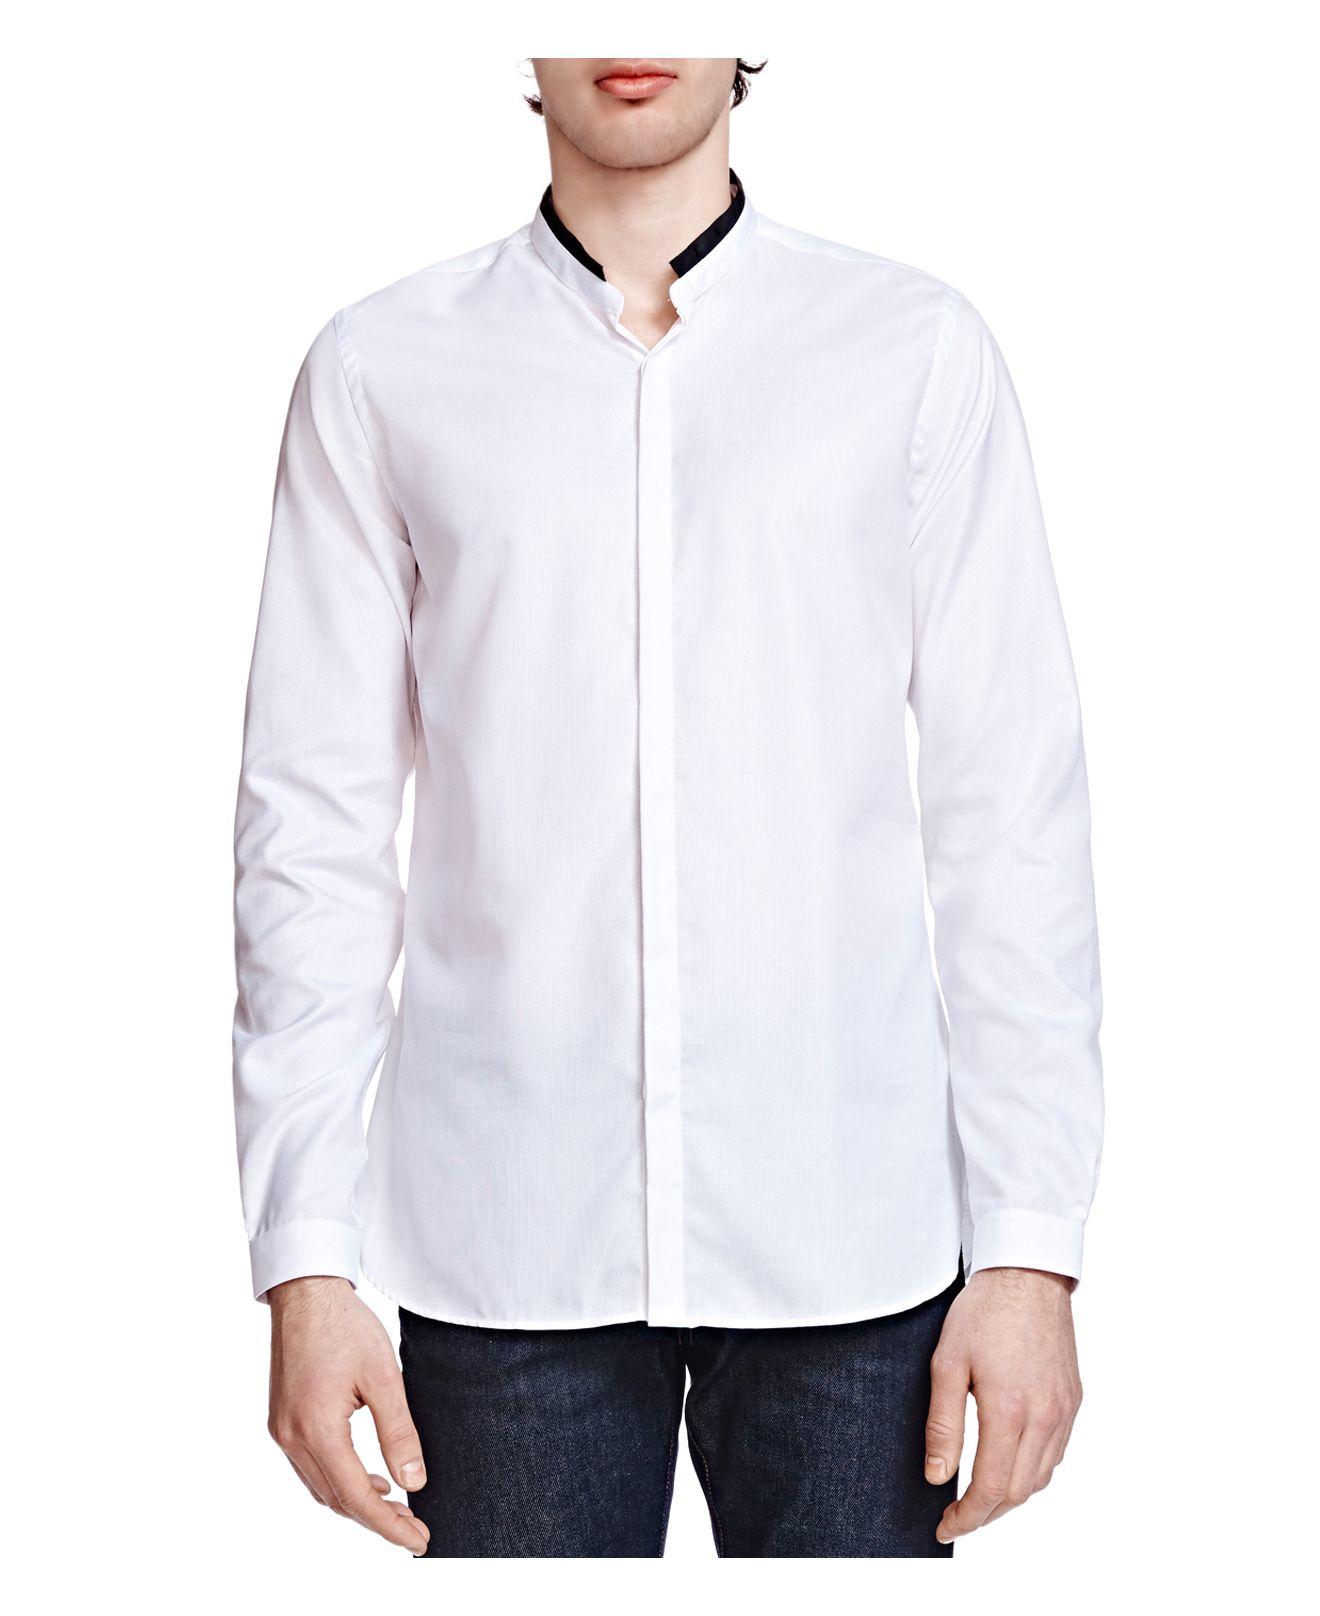 The kooples pique slim fit button down shirt in white for for Slim fit white button down shirt